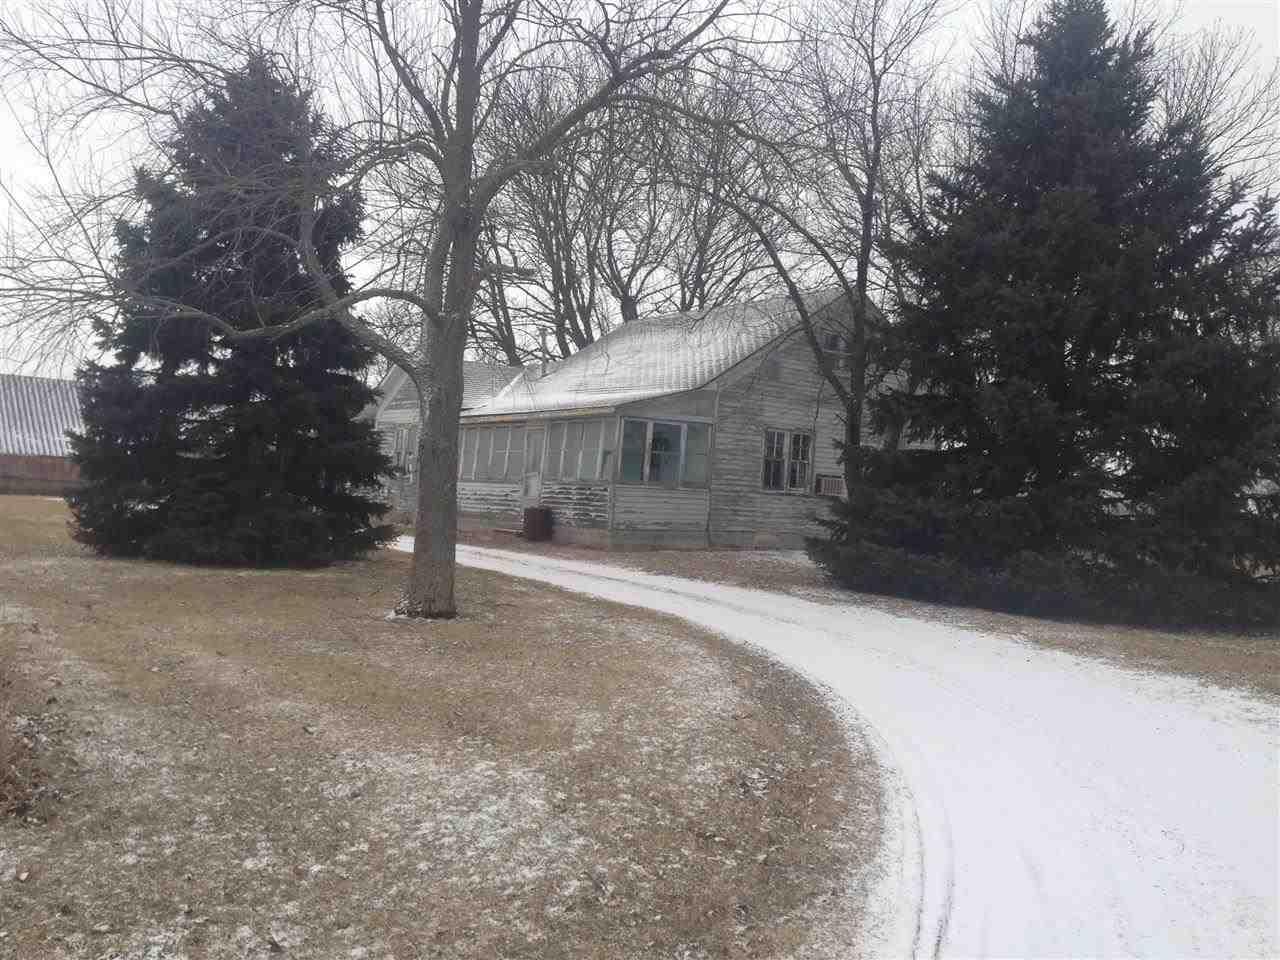 Real Estate for Sale, ListingId: 31868665, Atwood,IL61913